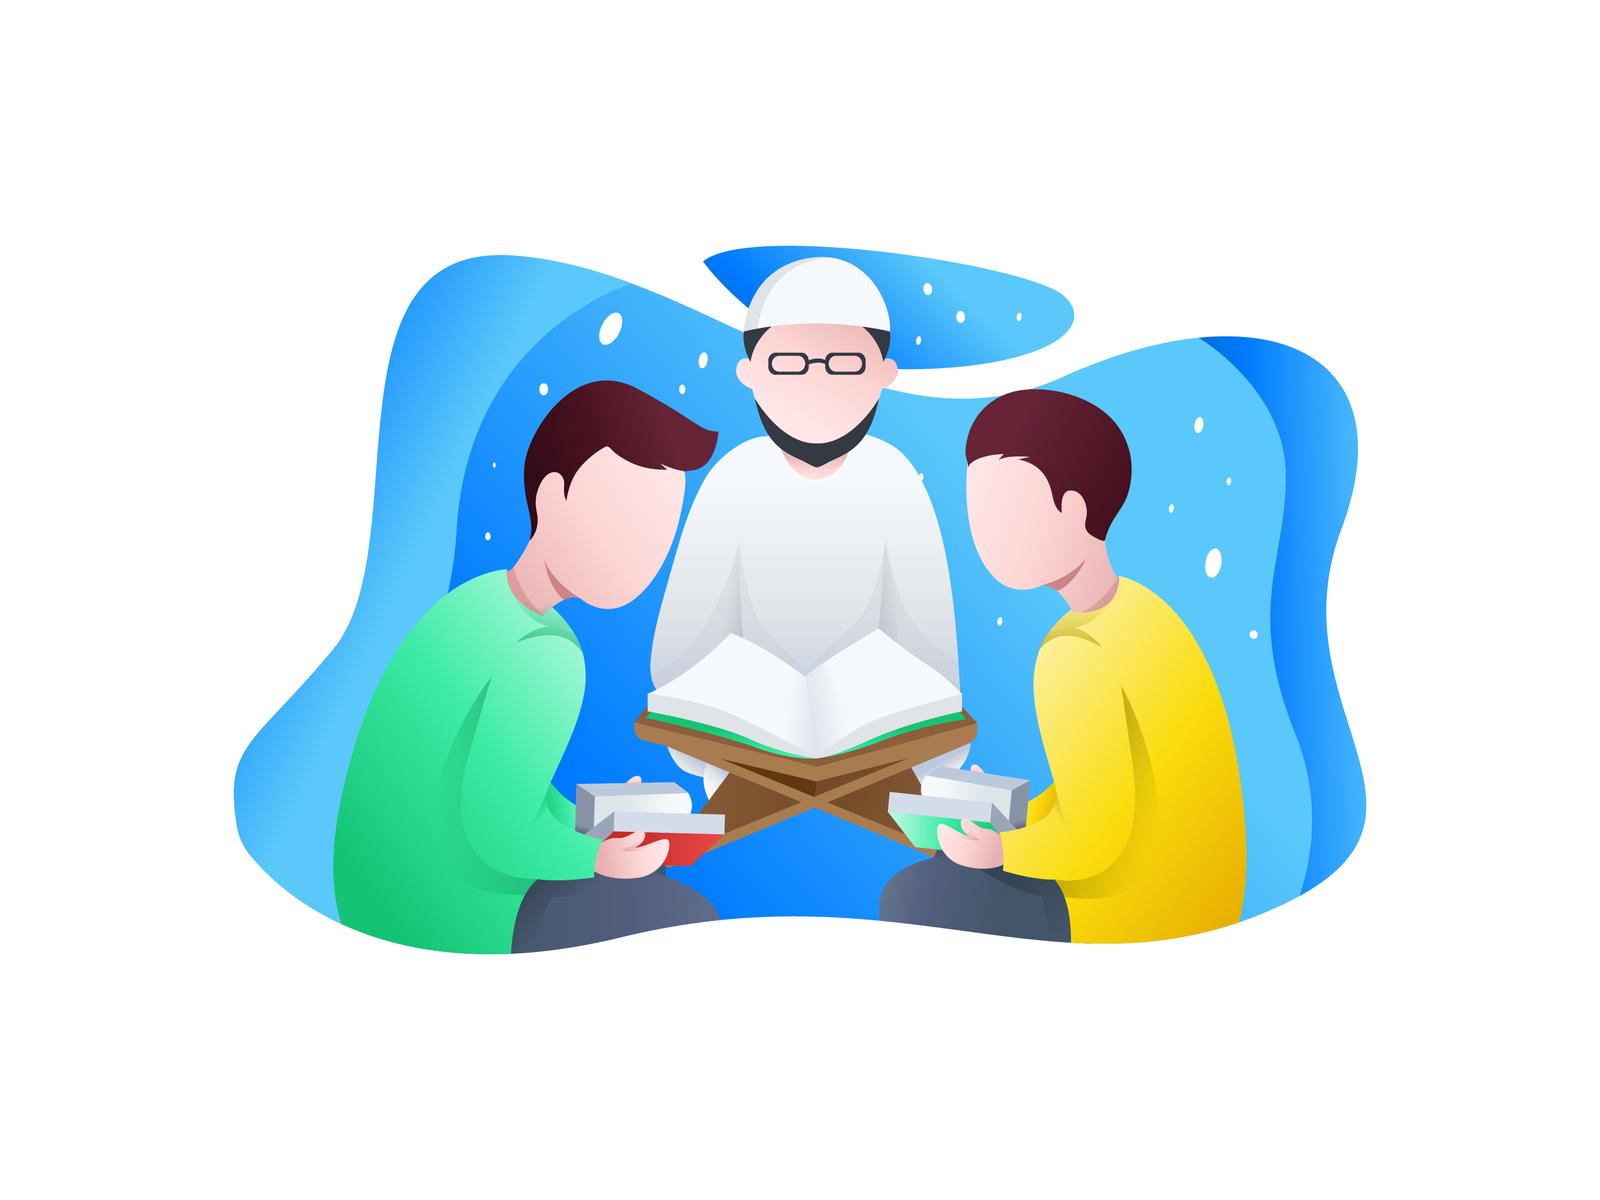 Child Reading Quran Illustration 65630775 - Megapixl